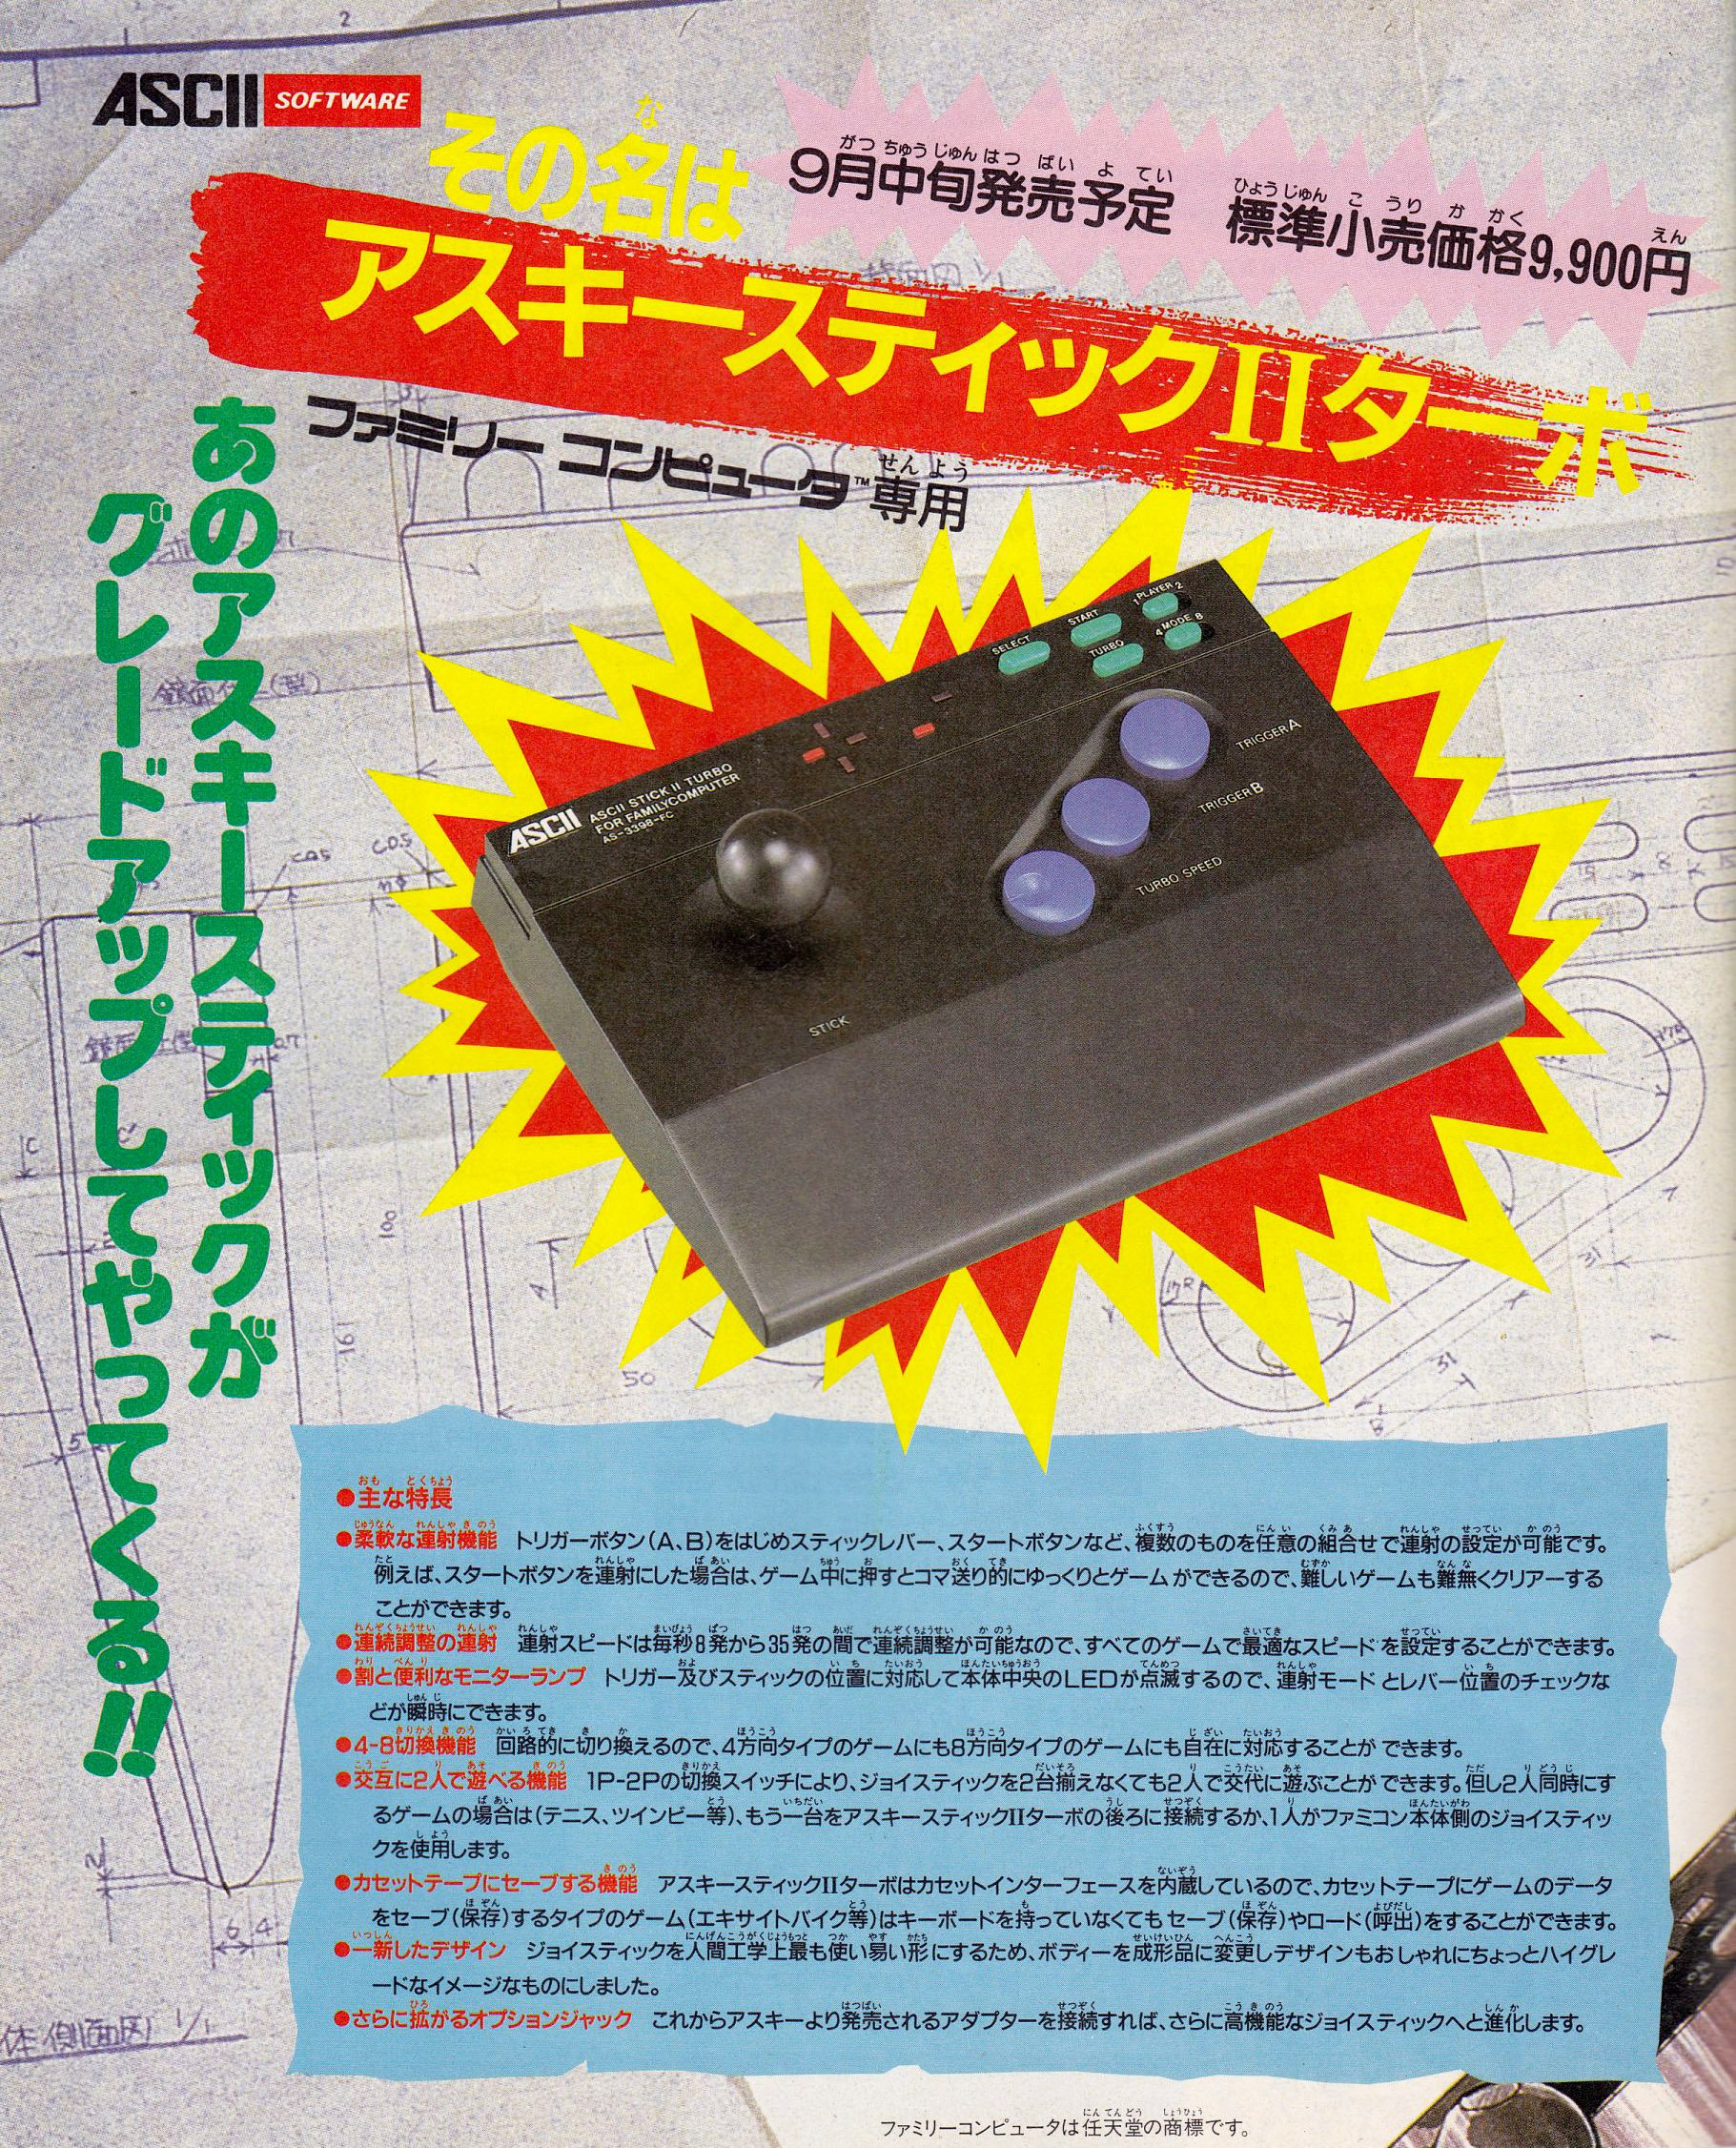 ASCII Stick II Turbo (Japan)